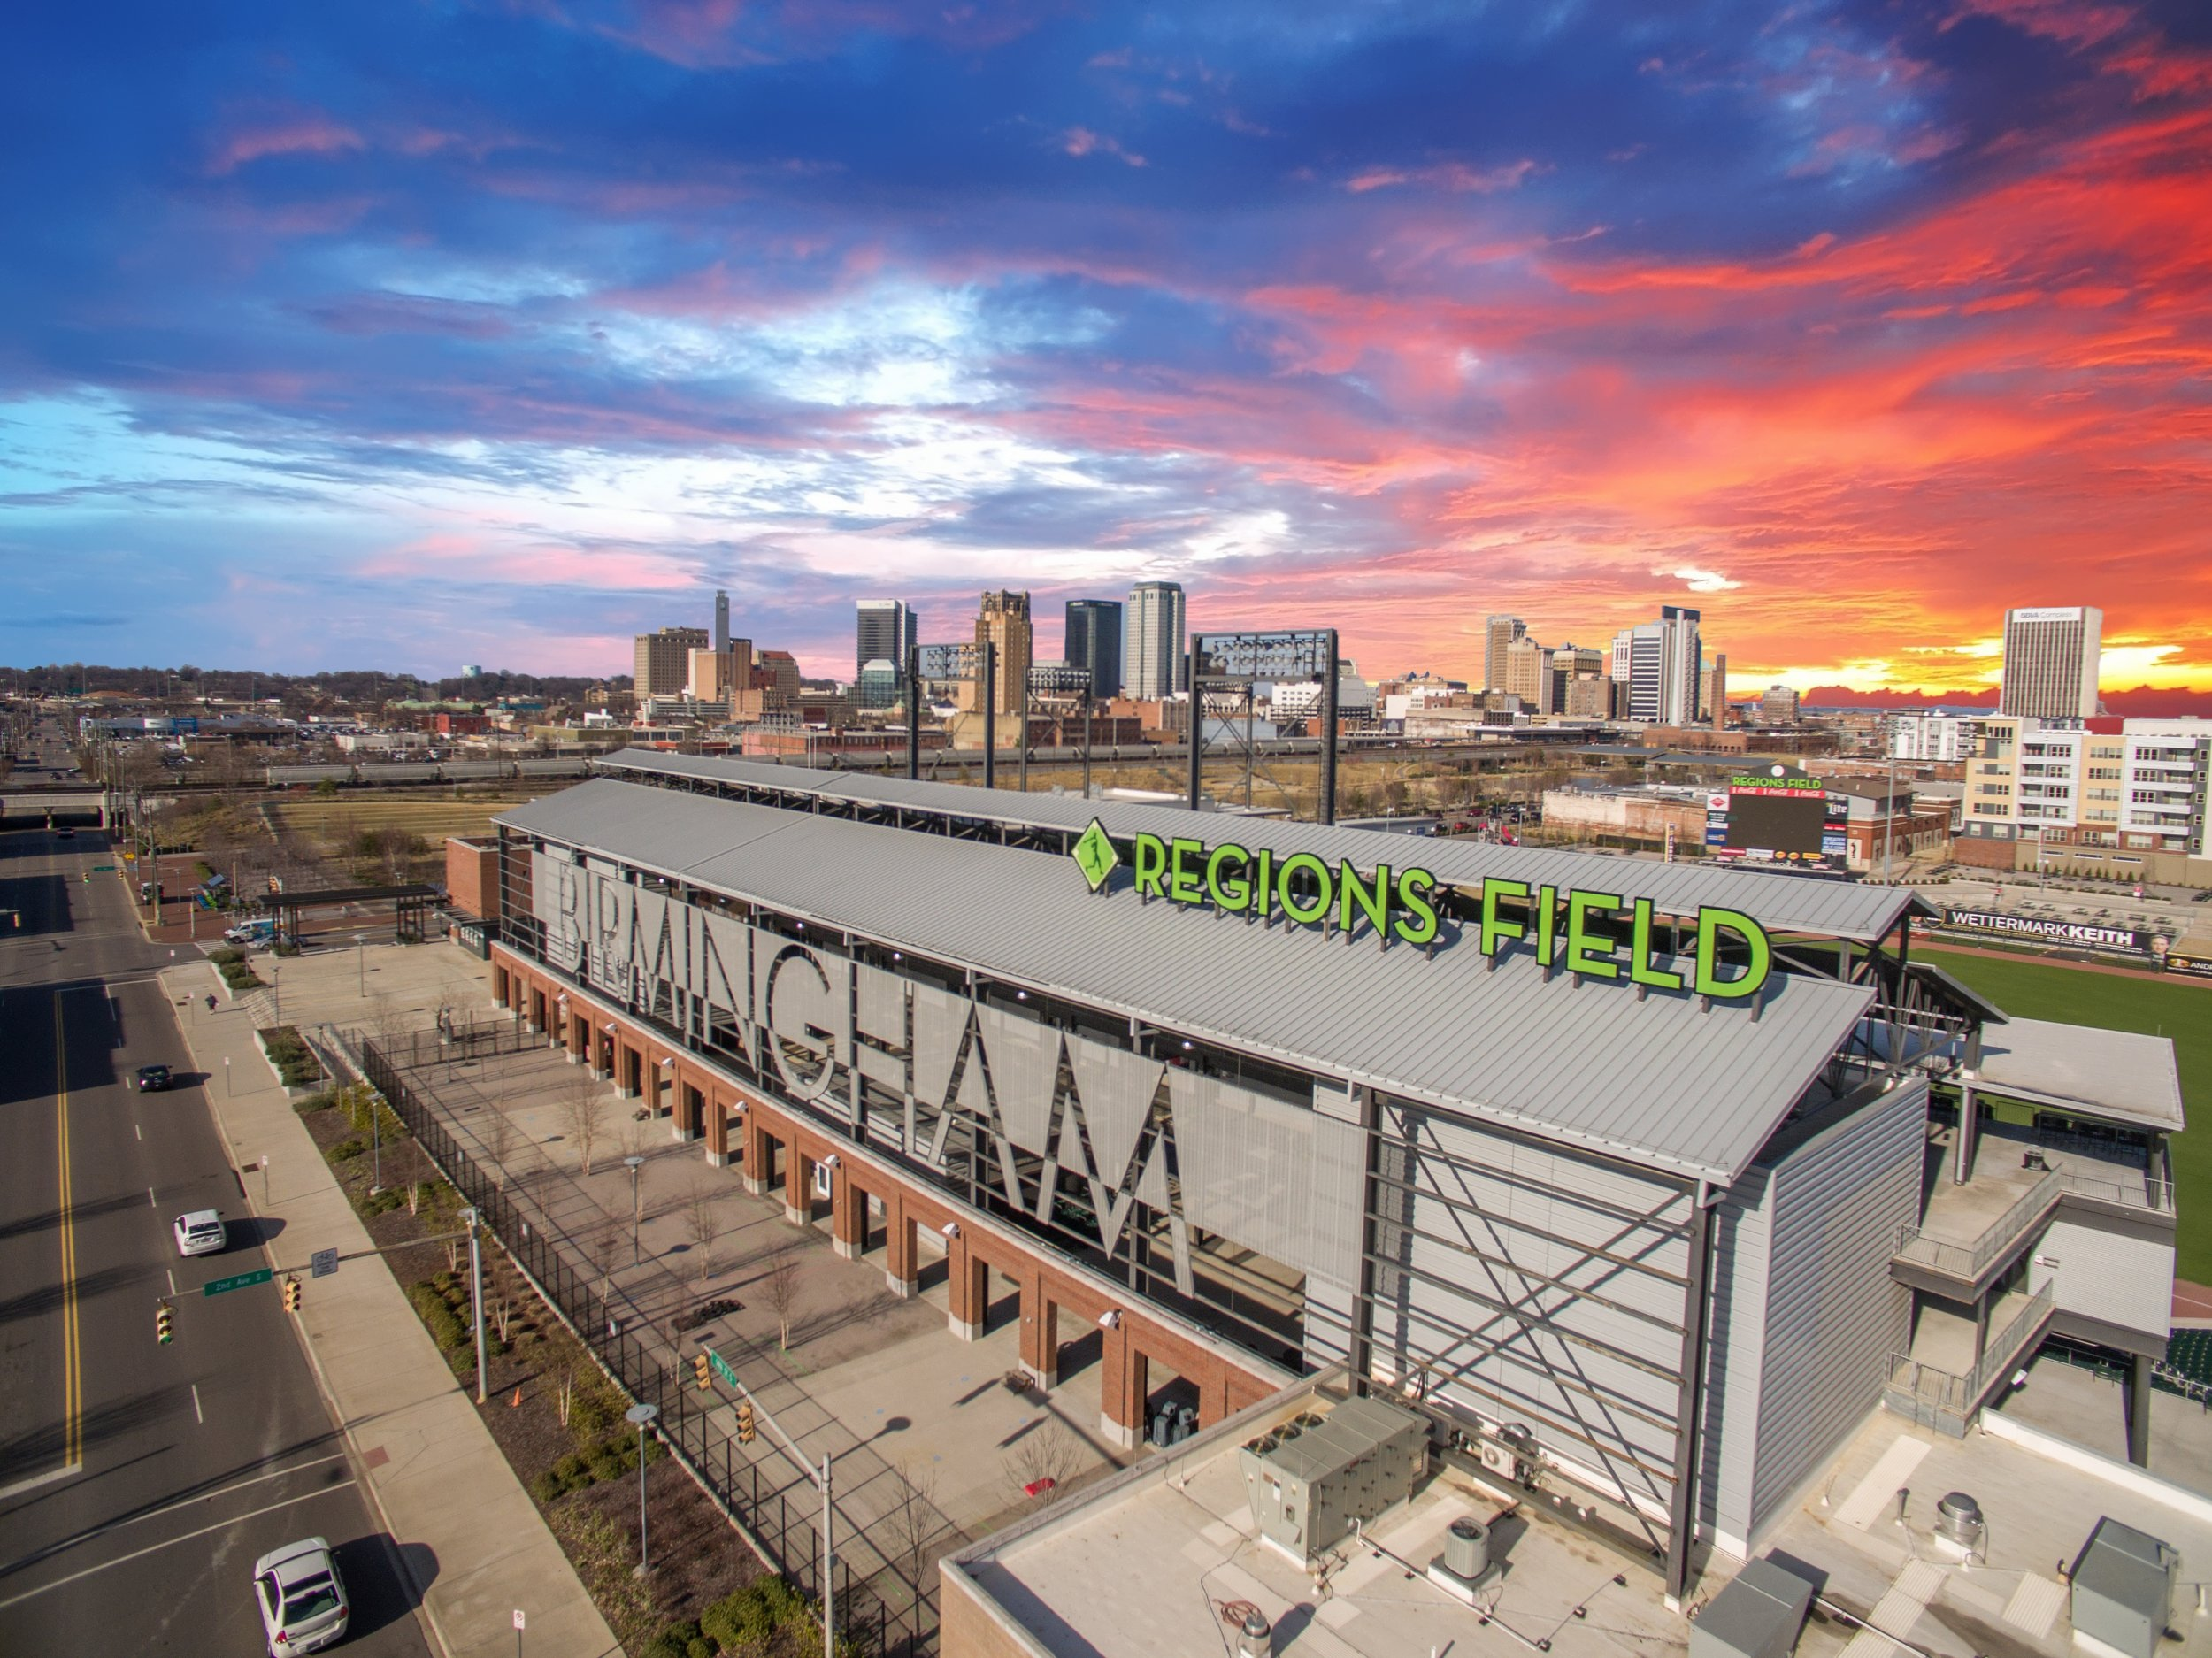 Regions Field Birmingham Alabama